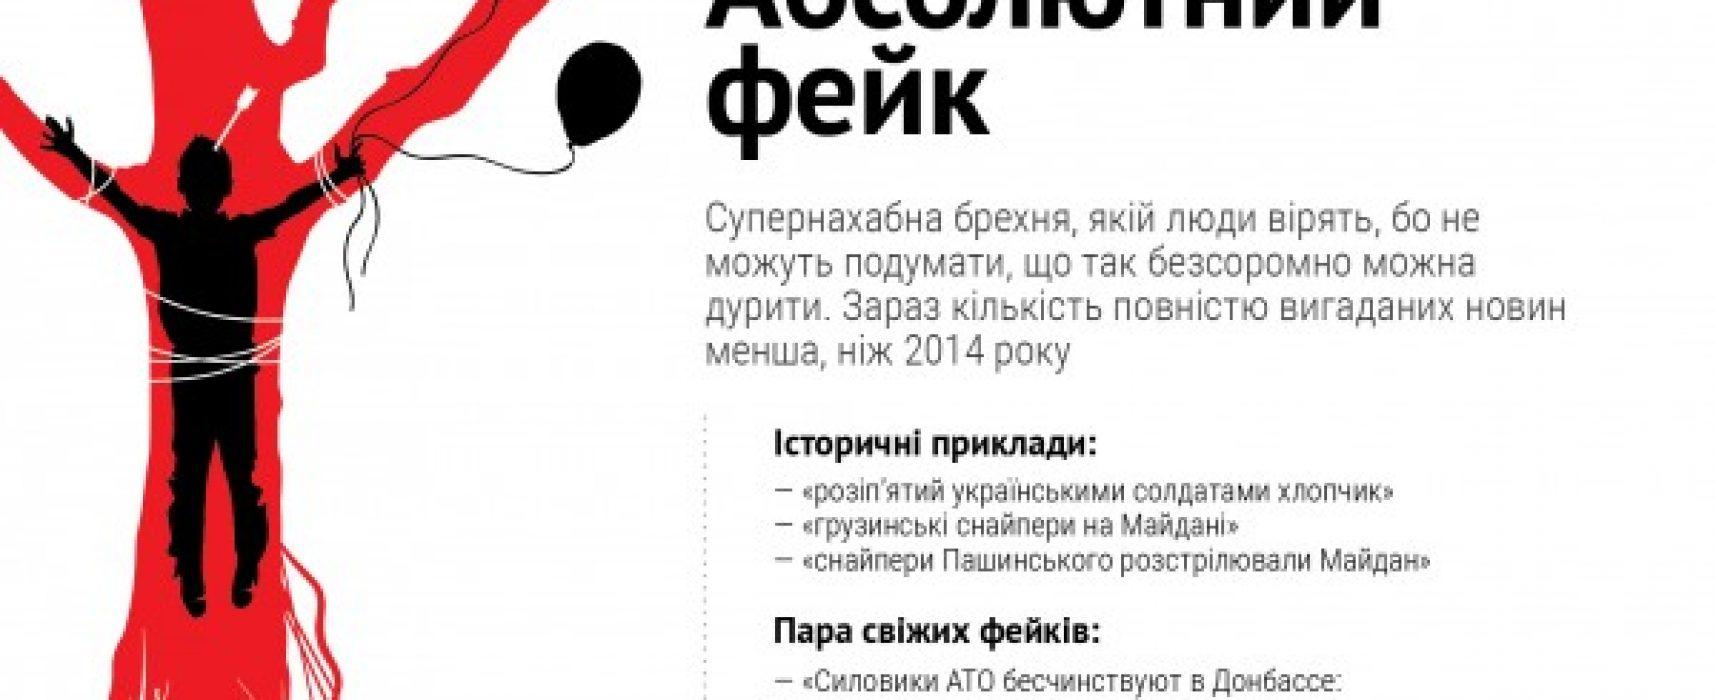 Un blog falso de un coronel estadounidense sobre Ucrania resultó ser una desinformación rusa